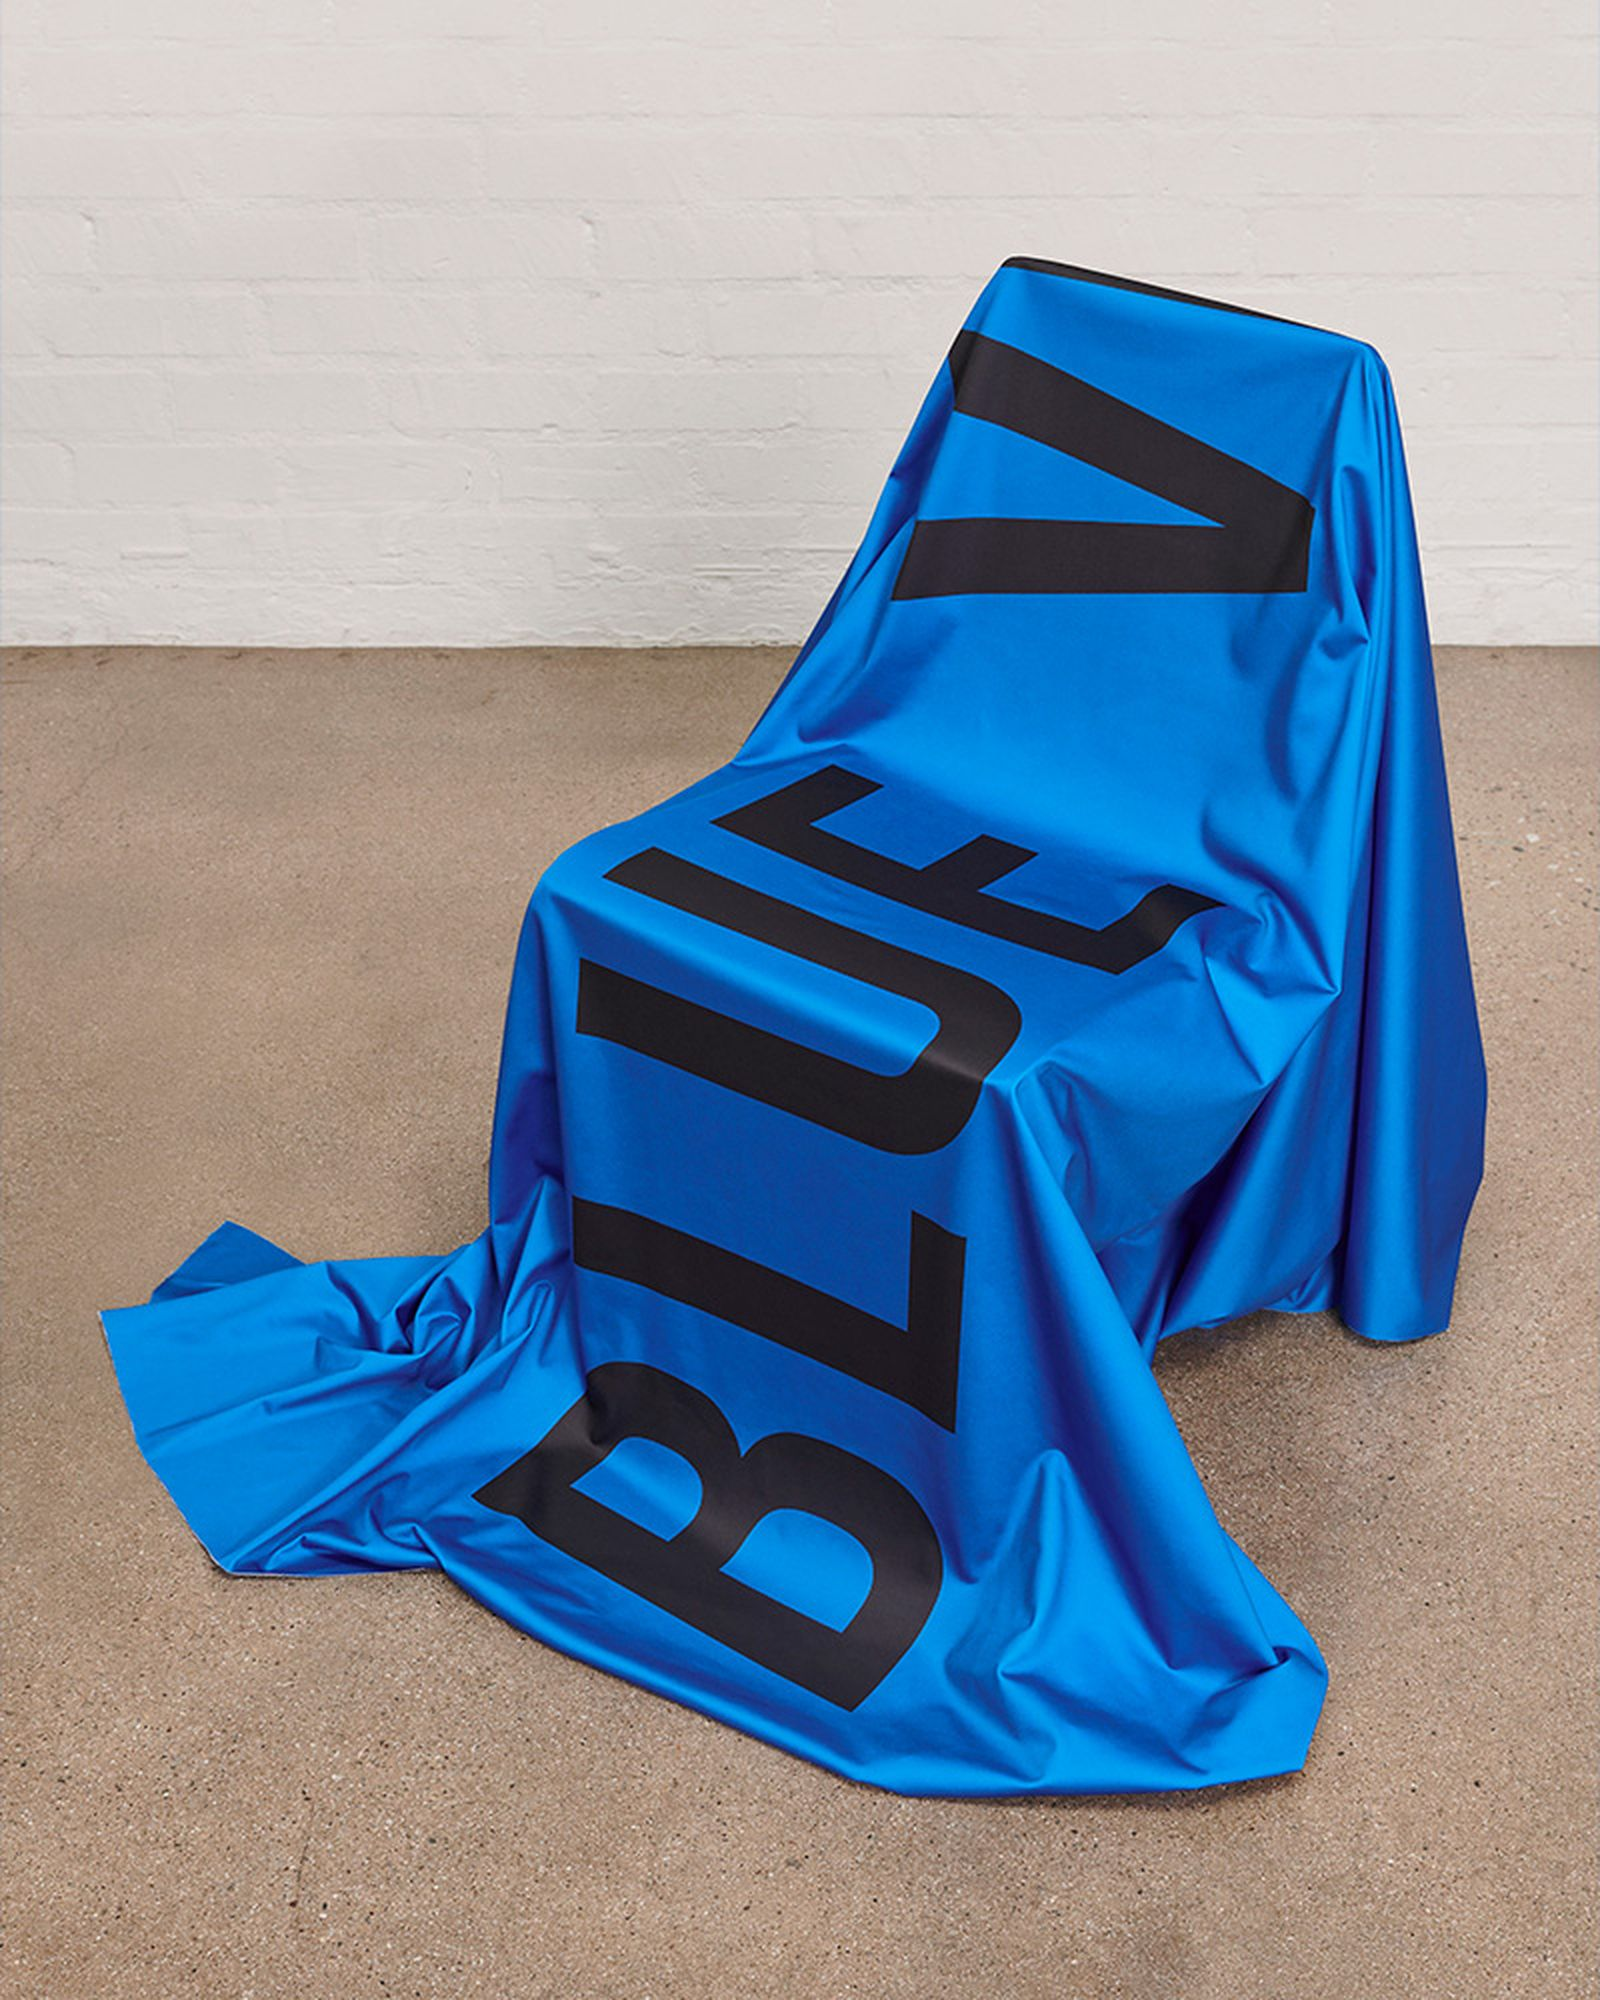 adidas-originals-blue-version-release-info-11